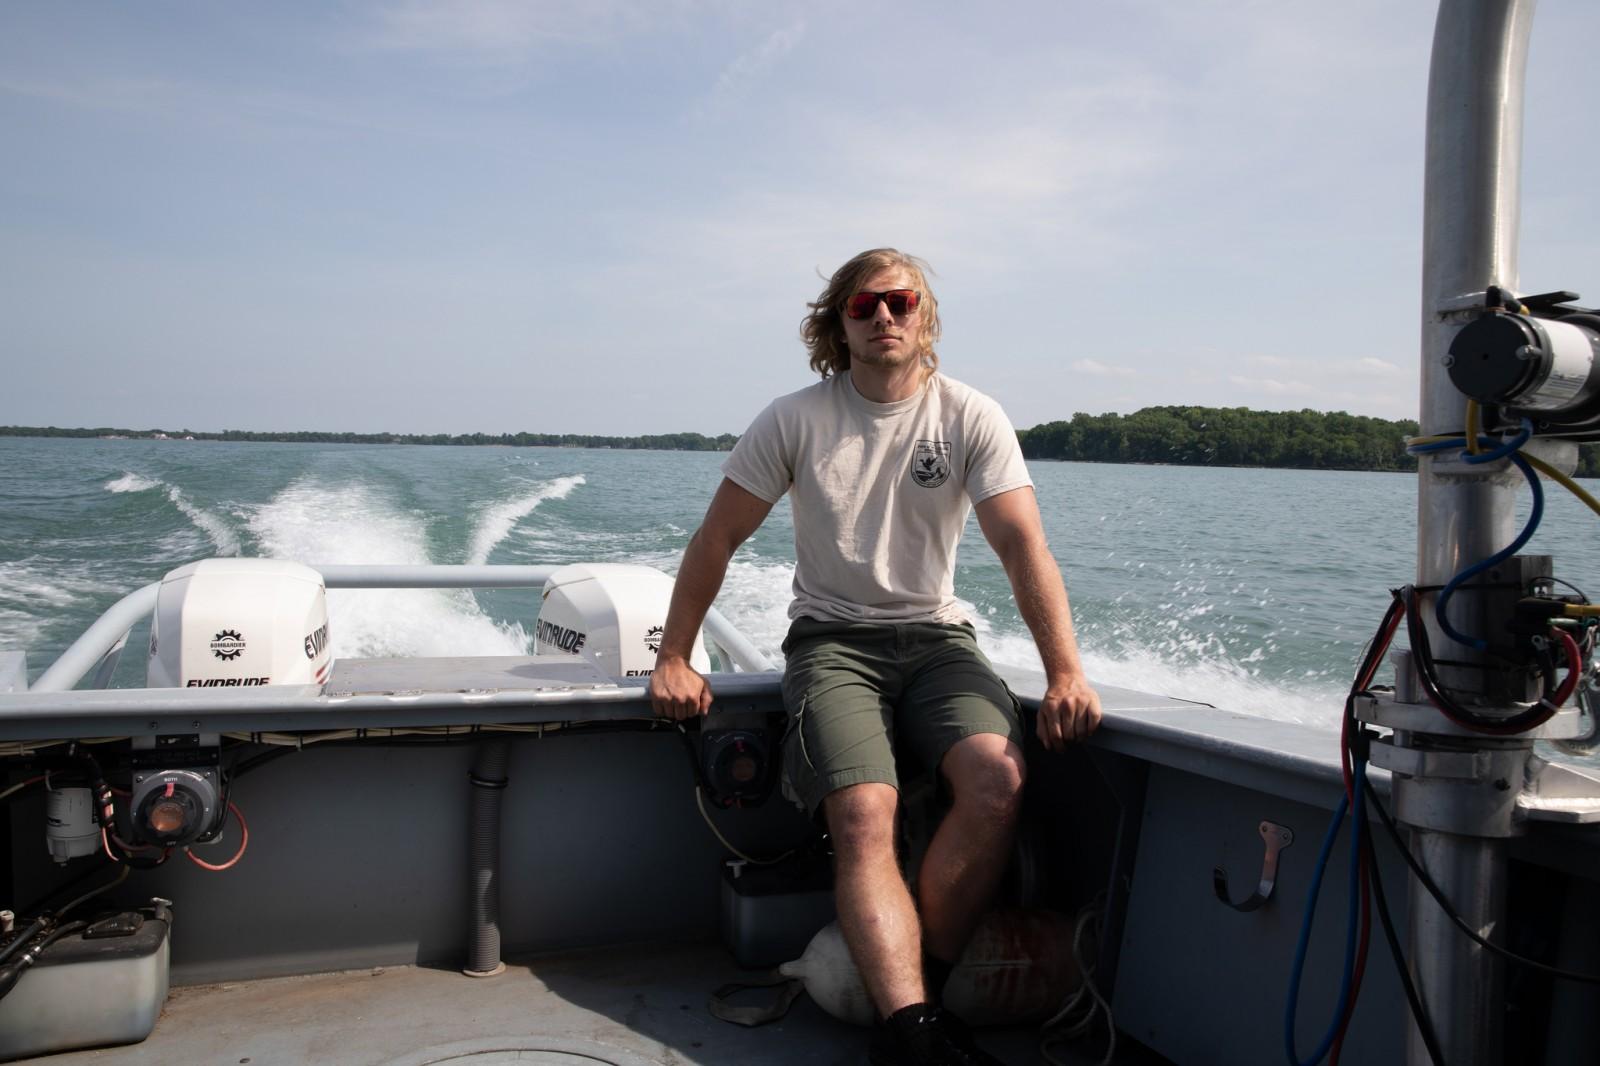 Vounteer on Boat